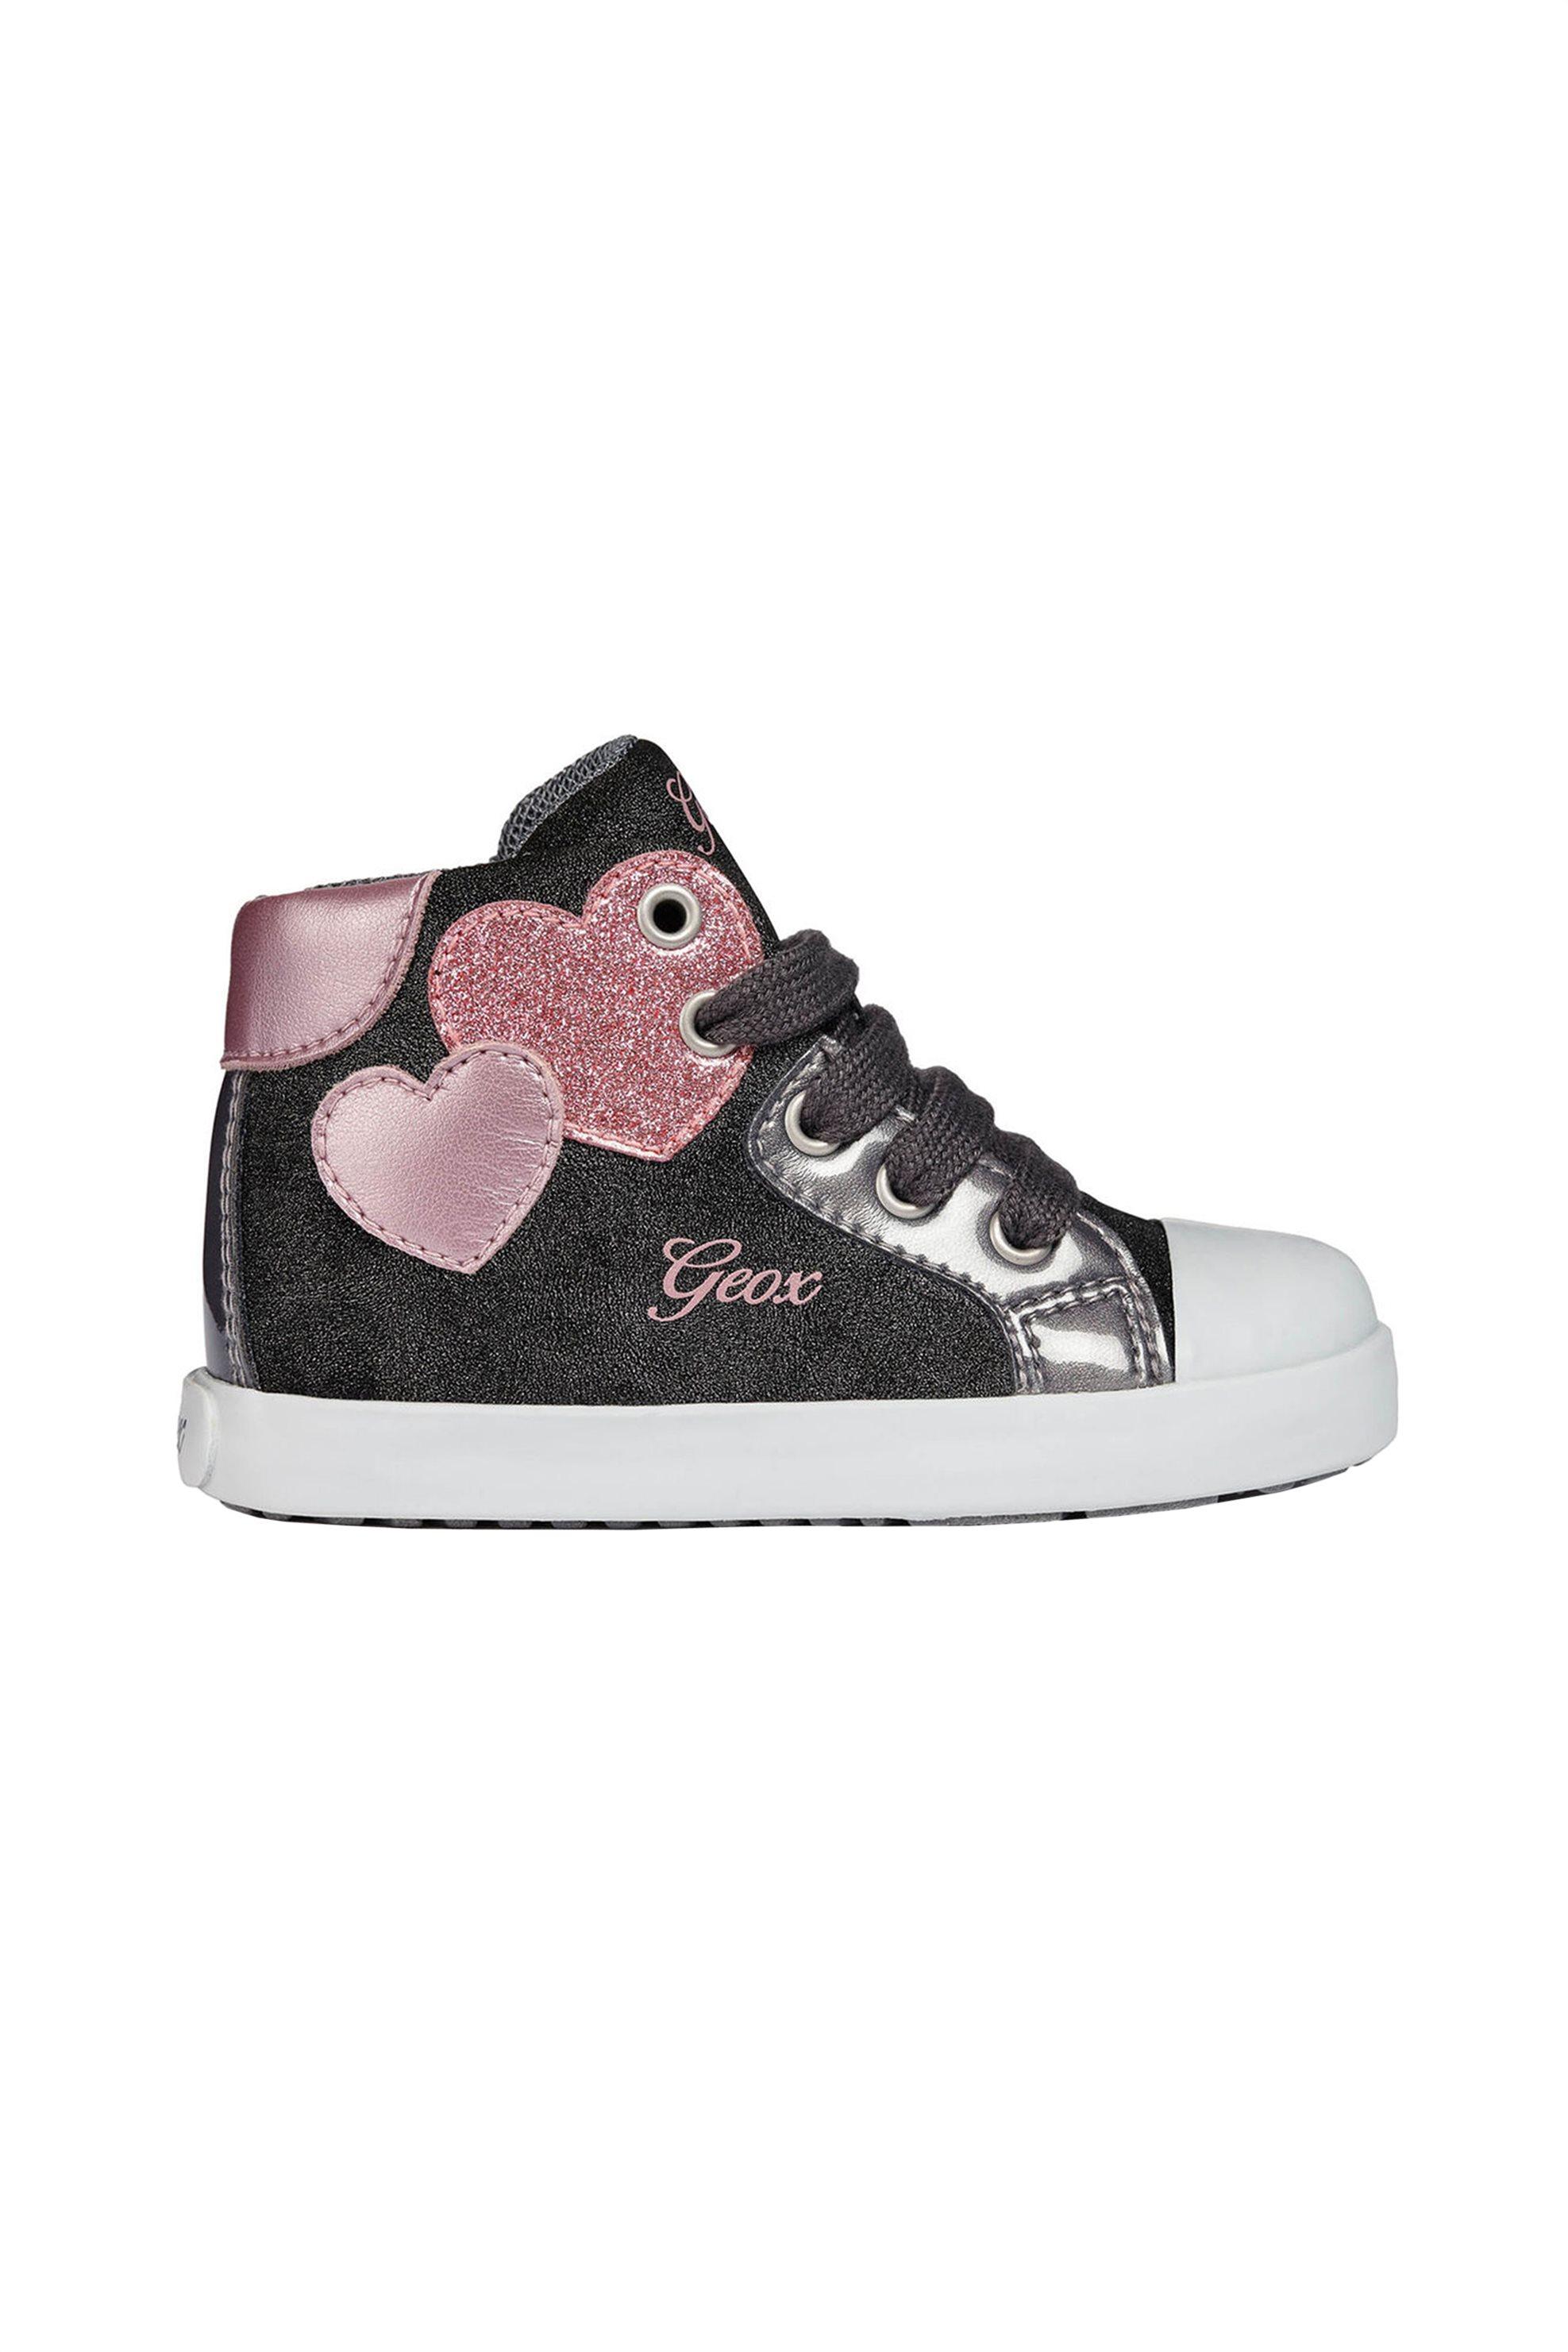 -30% Notos Geox παιδικά sneakers μποτάκια Baby Kilwi Girl – B84D5C – Μαύρο fad52c3aba4